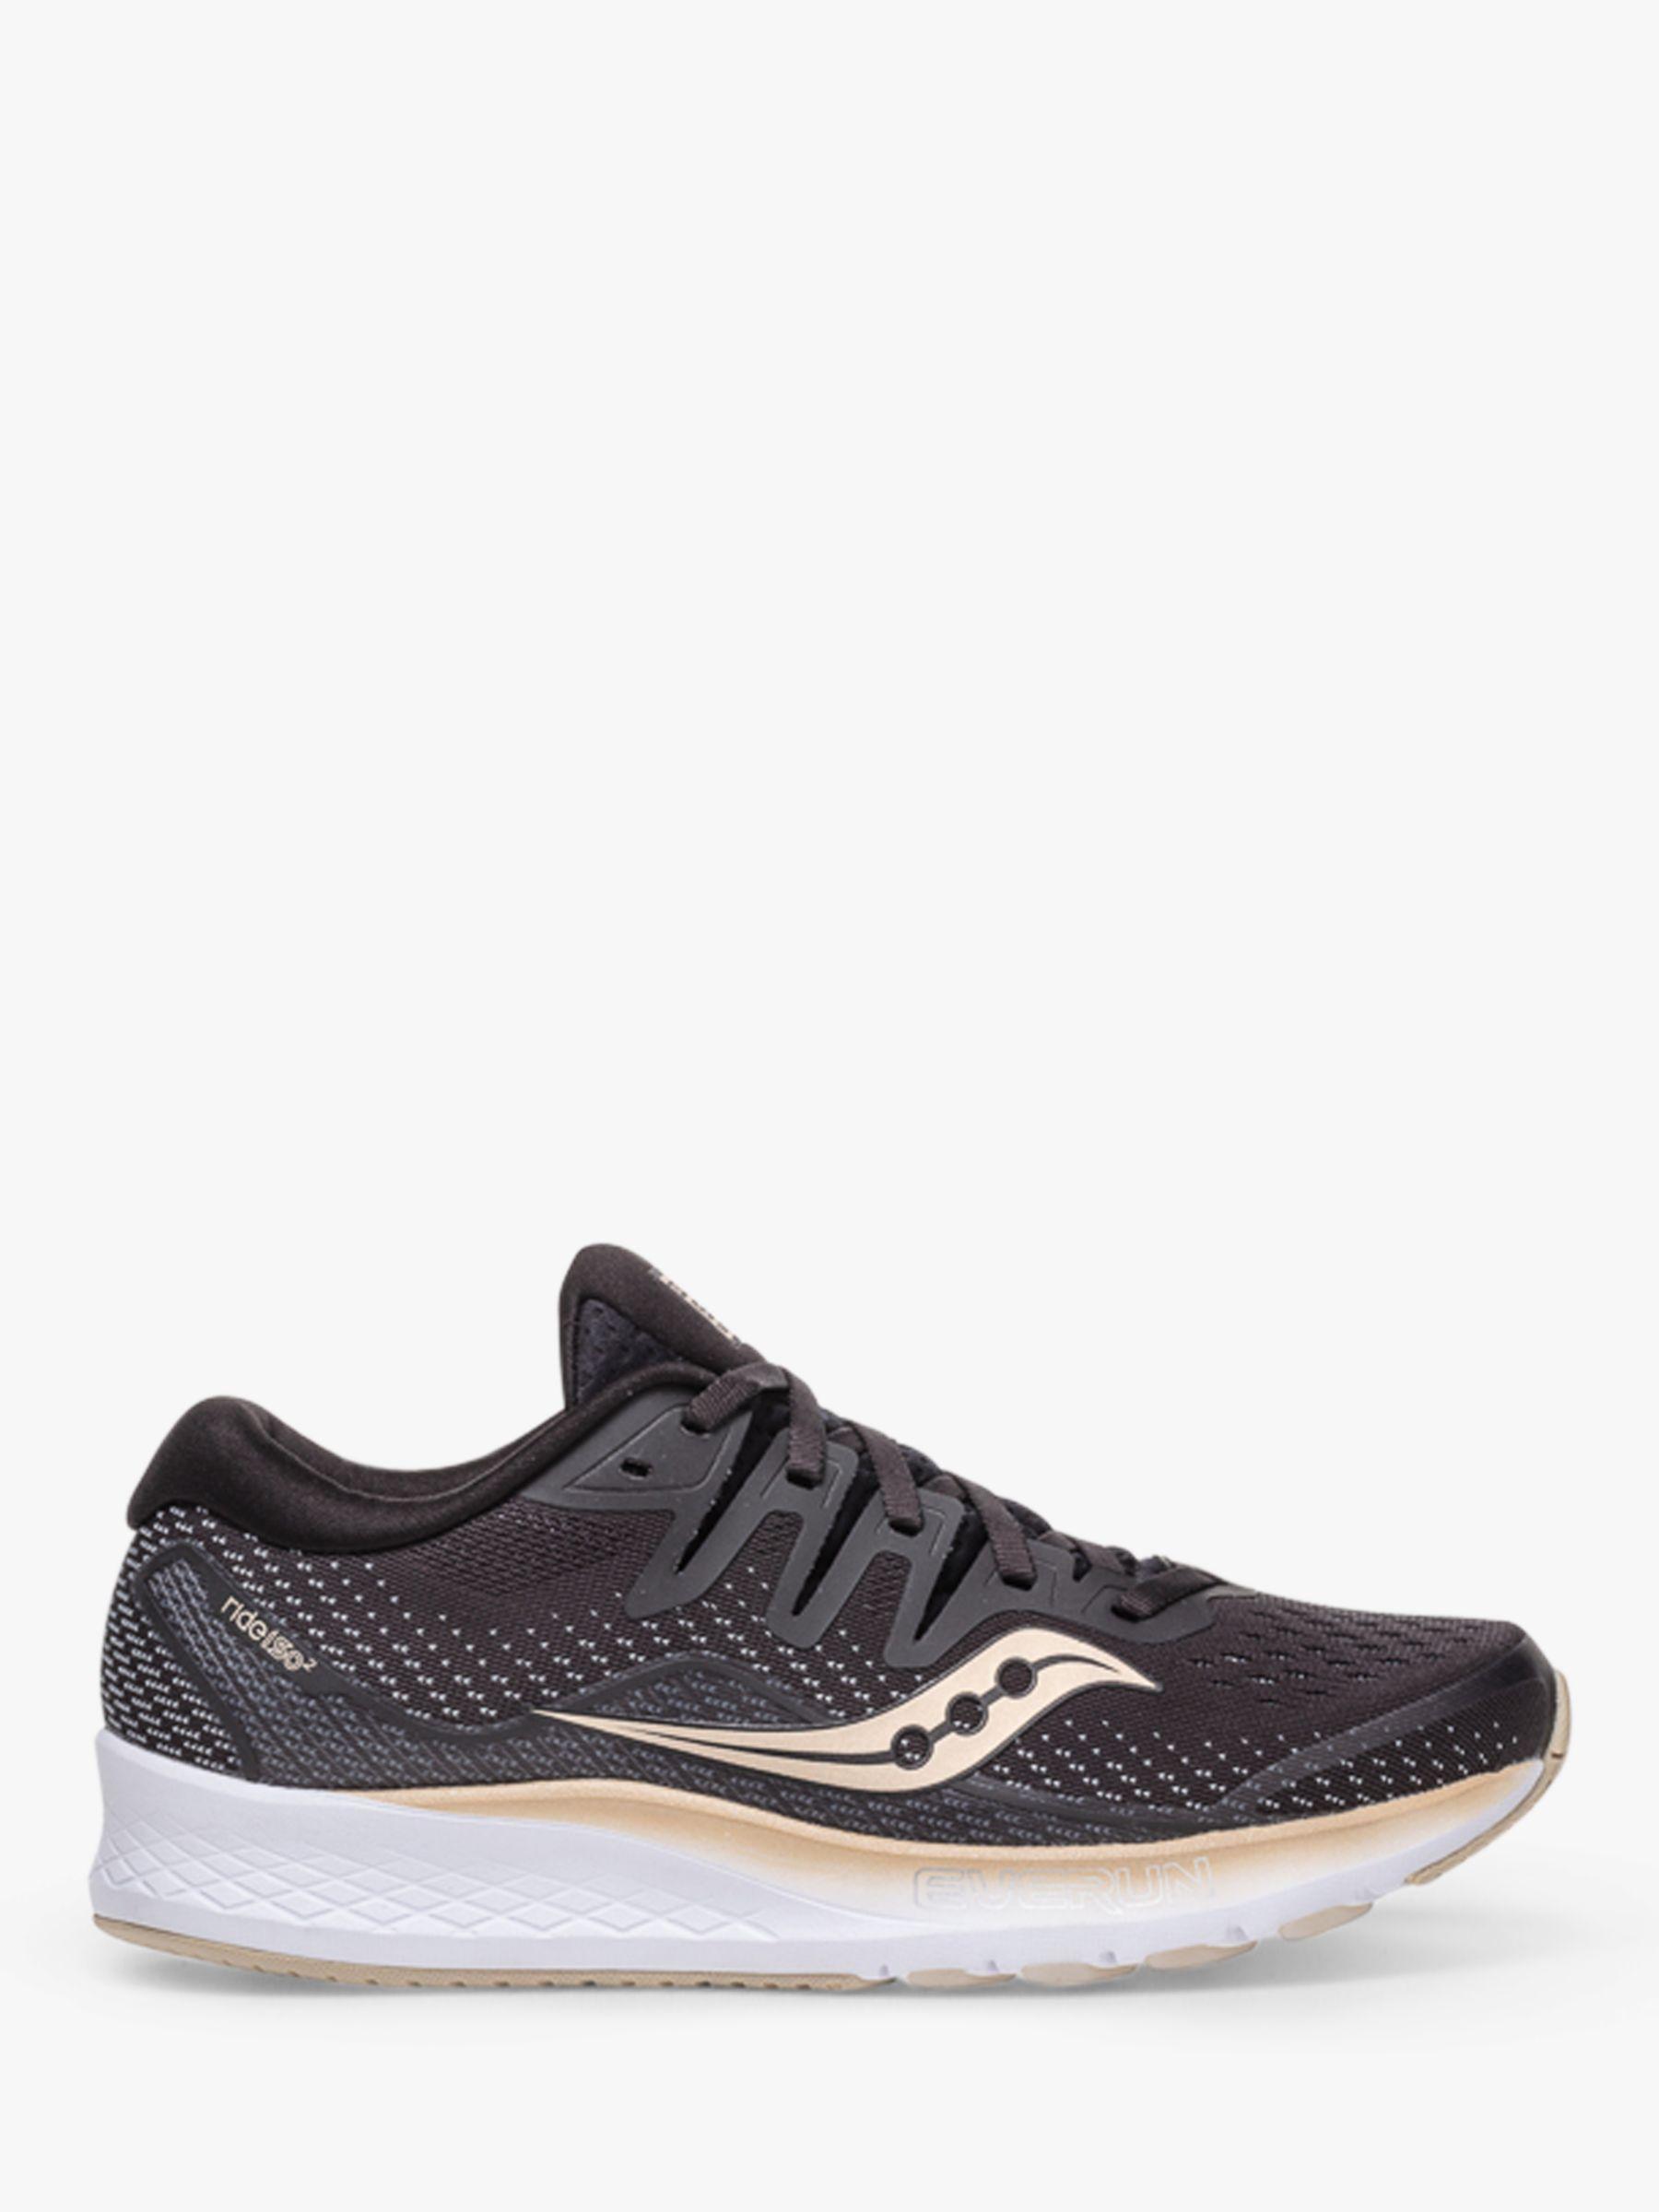 Saucony Saucony Ride ISO 2 Women's Running Shoes